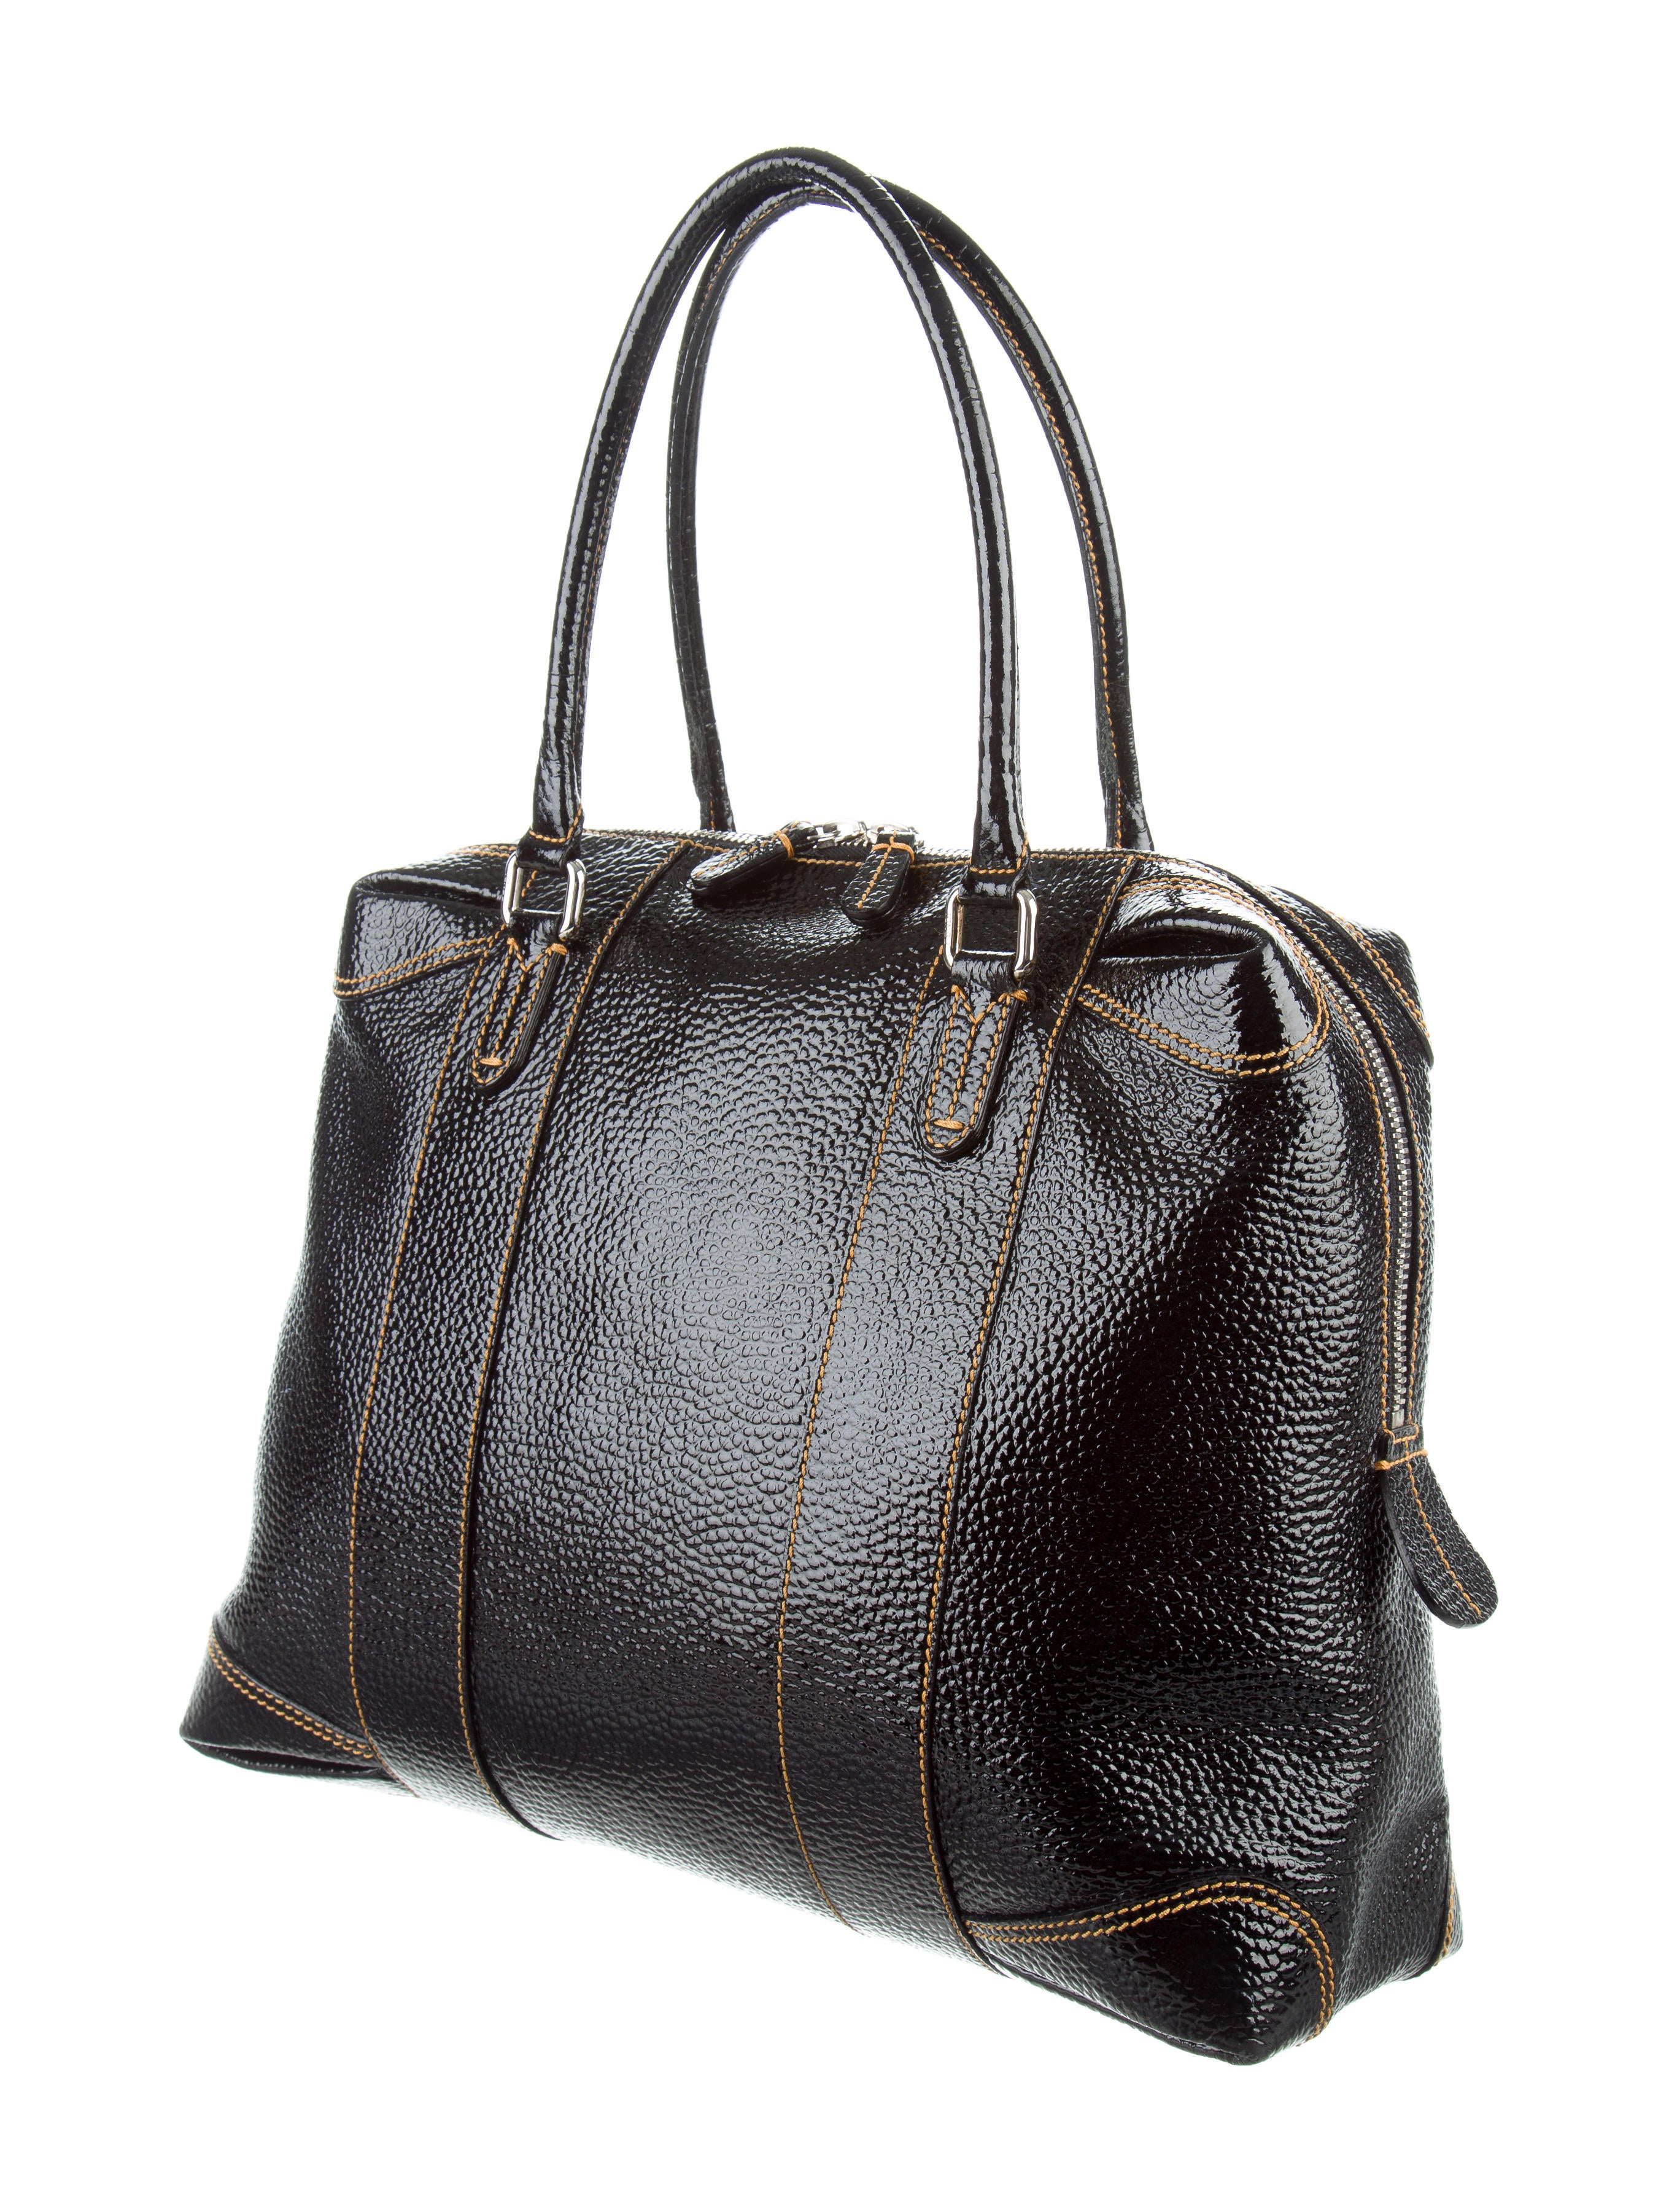 Boston Bag Patchwork Tutorial: Fendi Large Boston Bag - Handbags - FEN63464